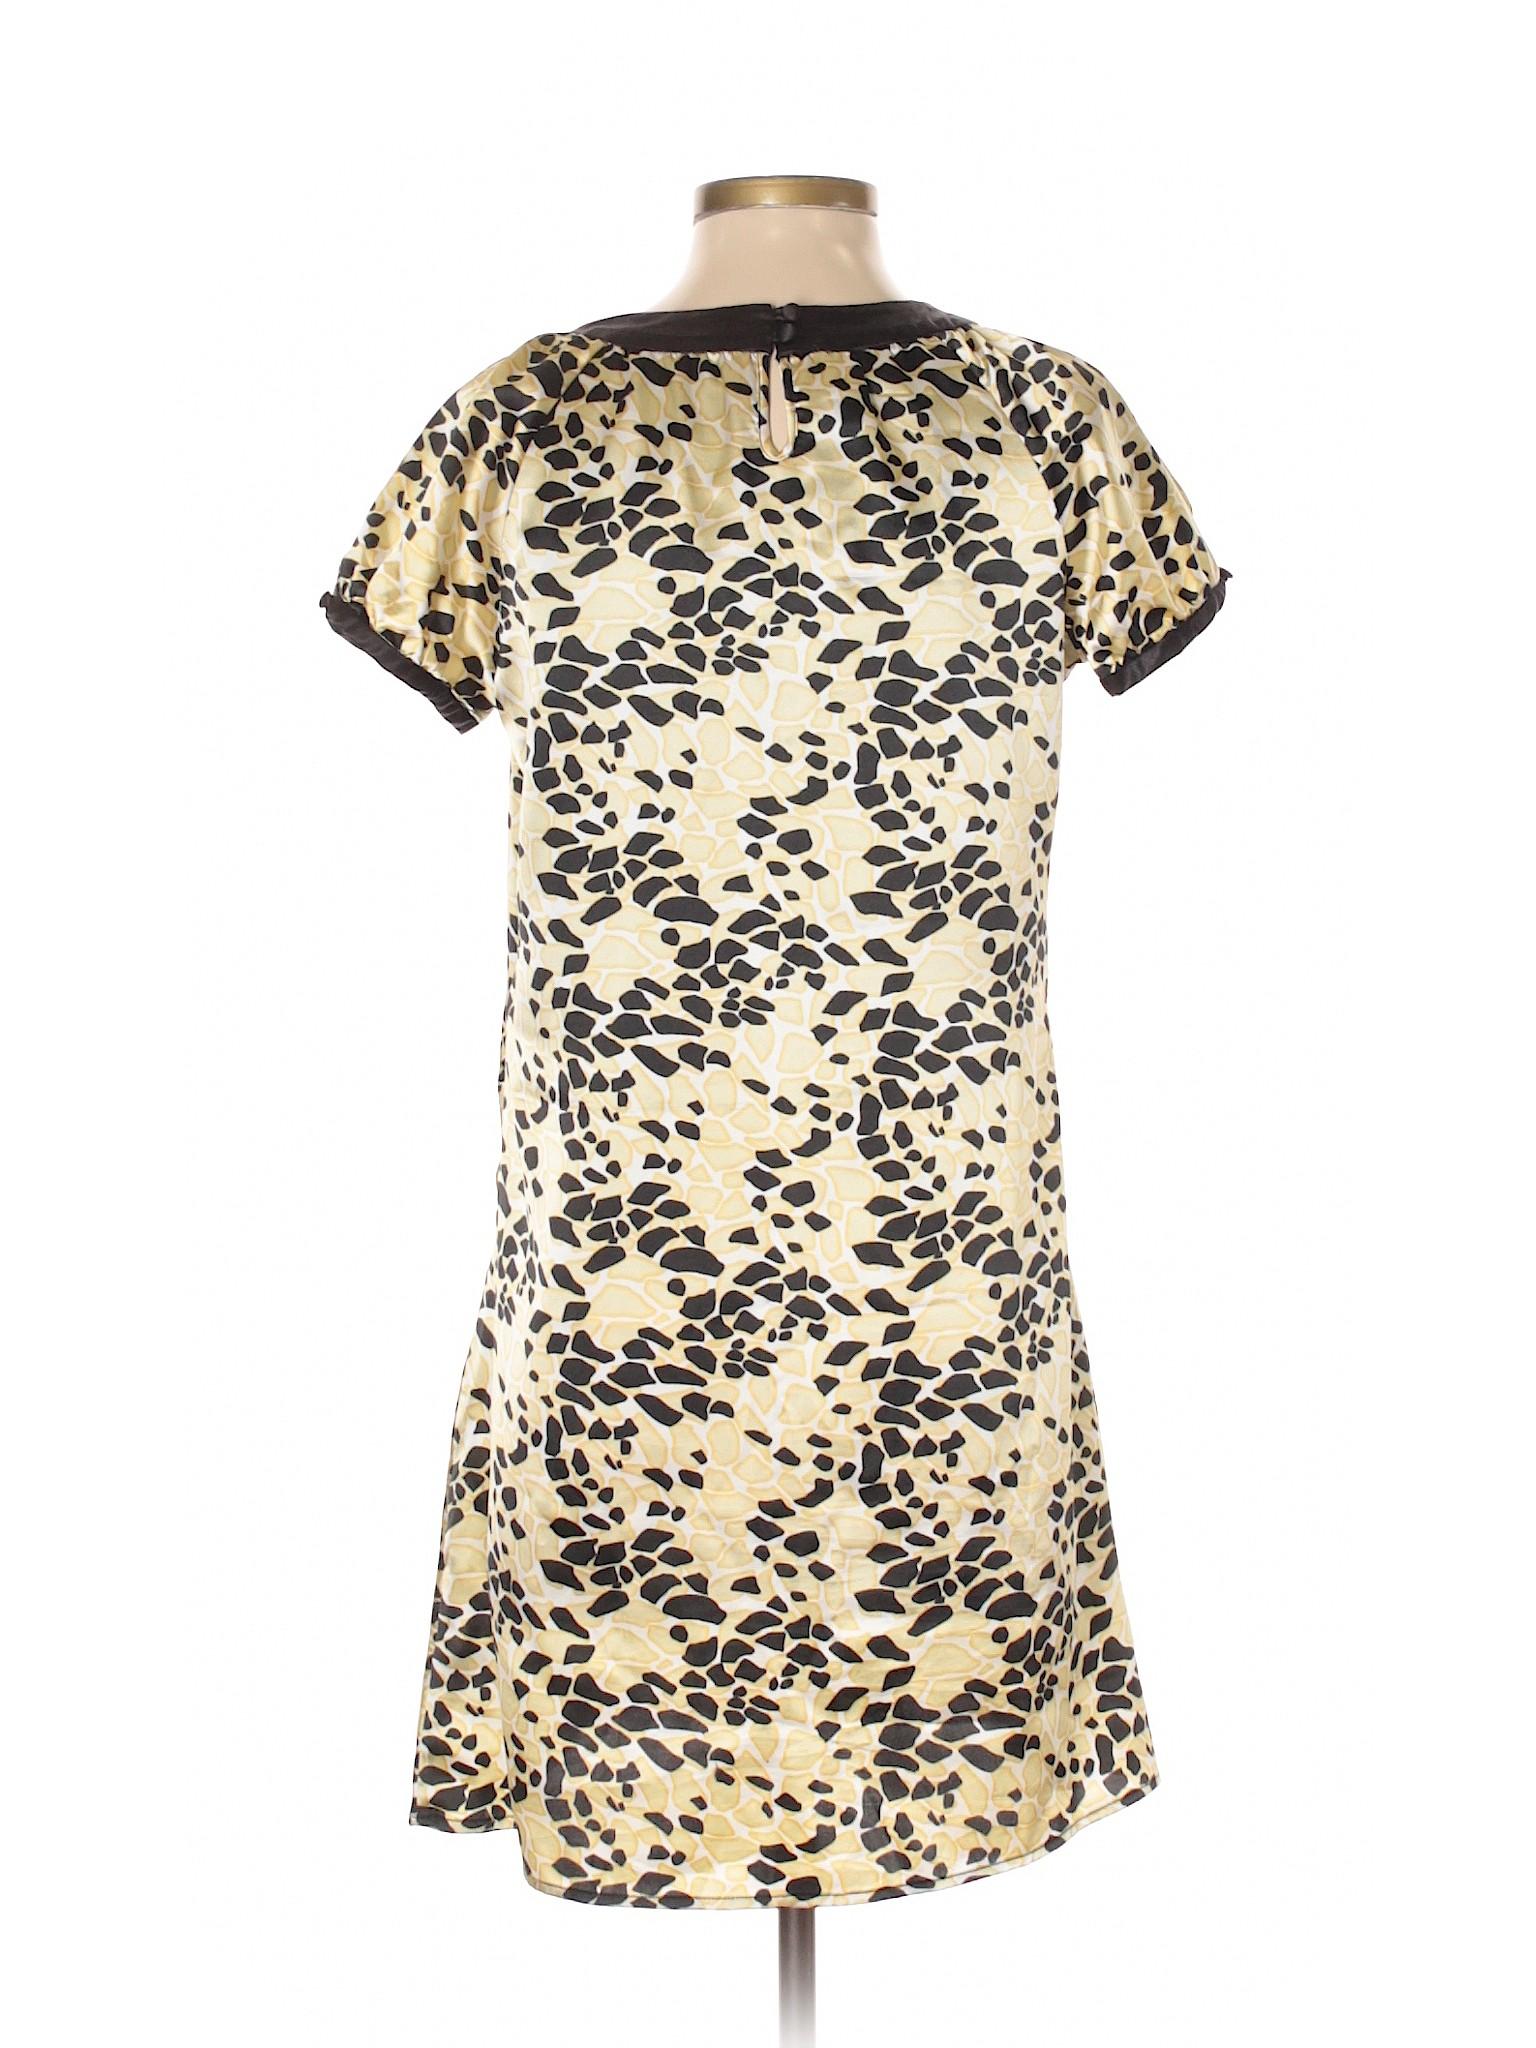 Boutique winter Boutique winter Dress BCBGMAXAZRIA Casual 8qgxOxPR